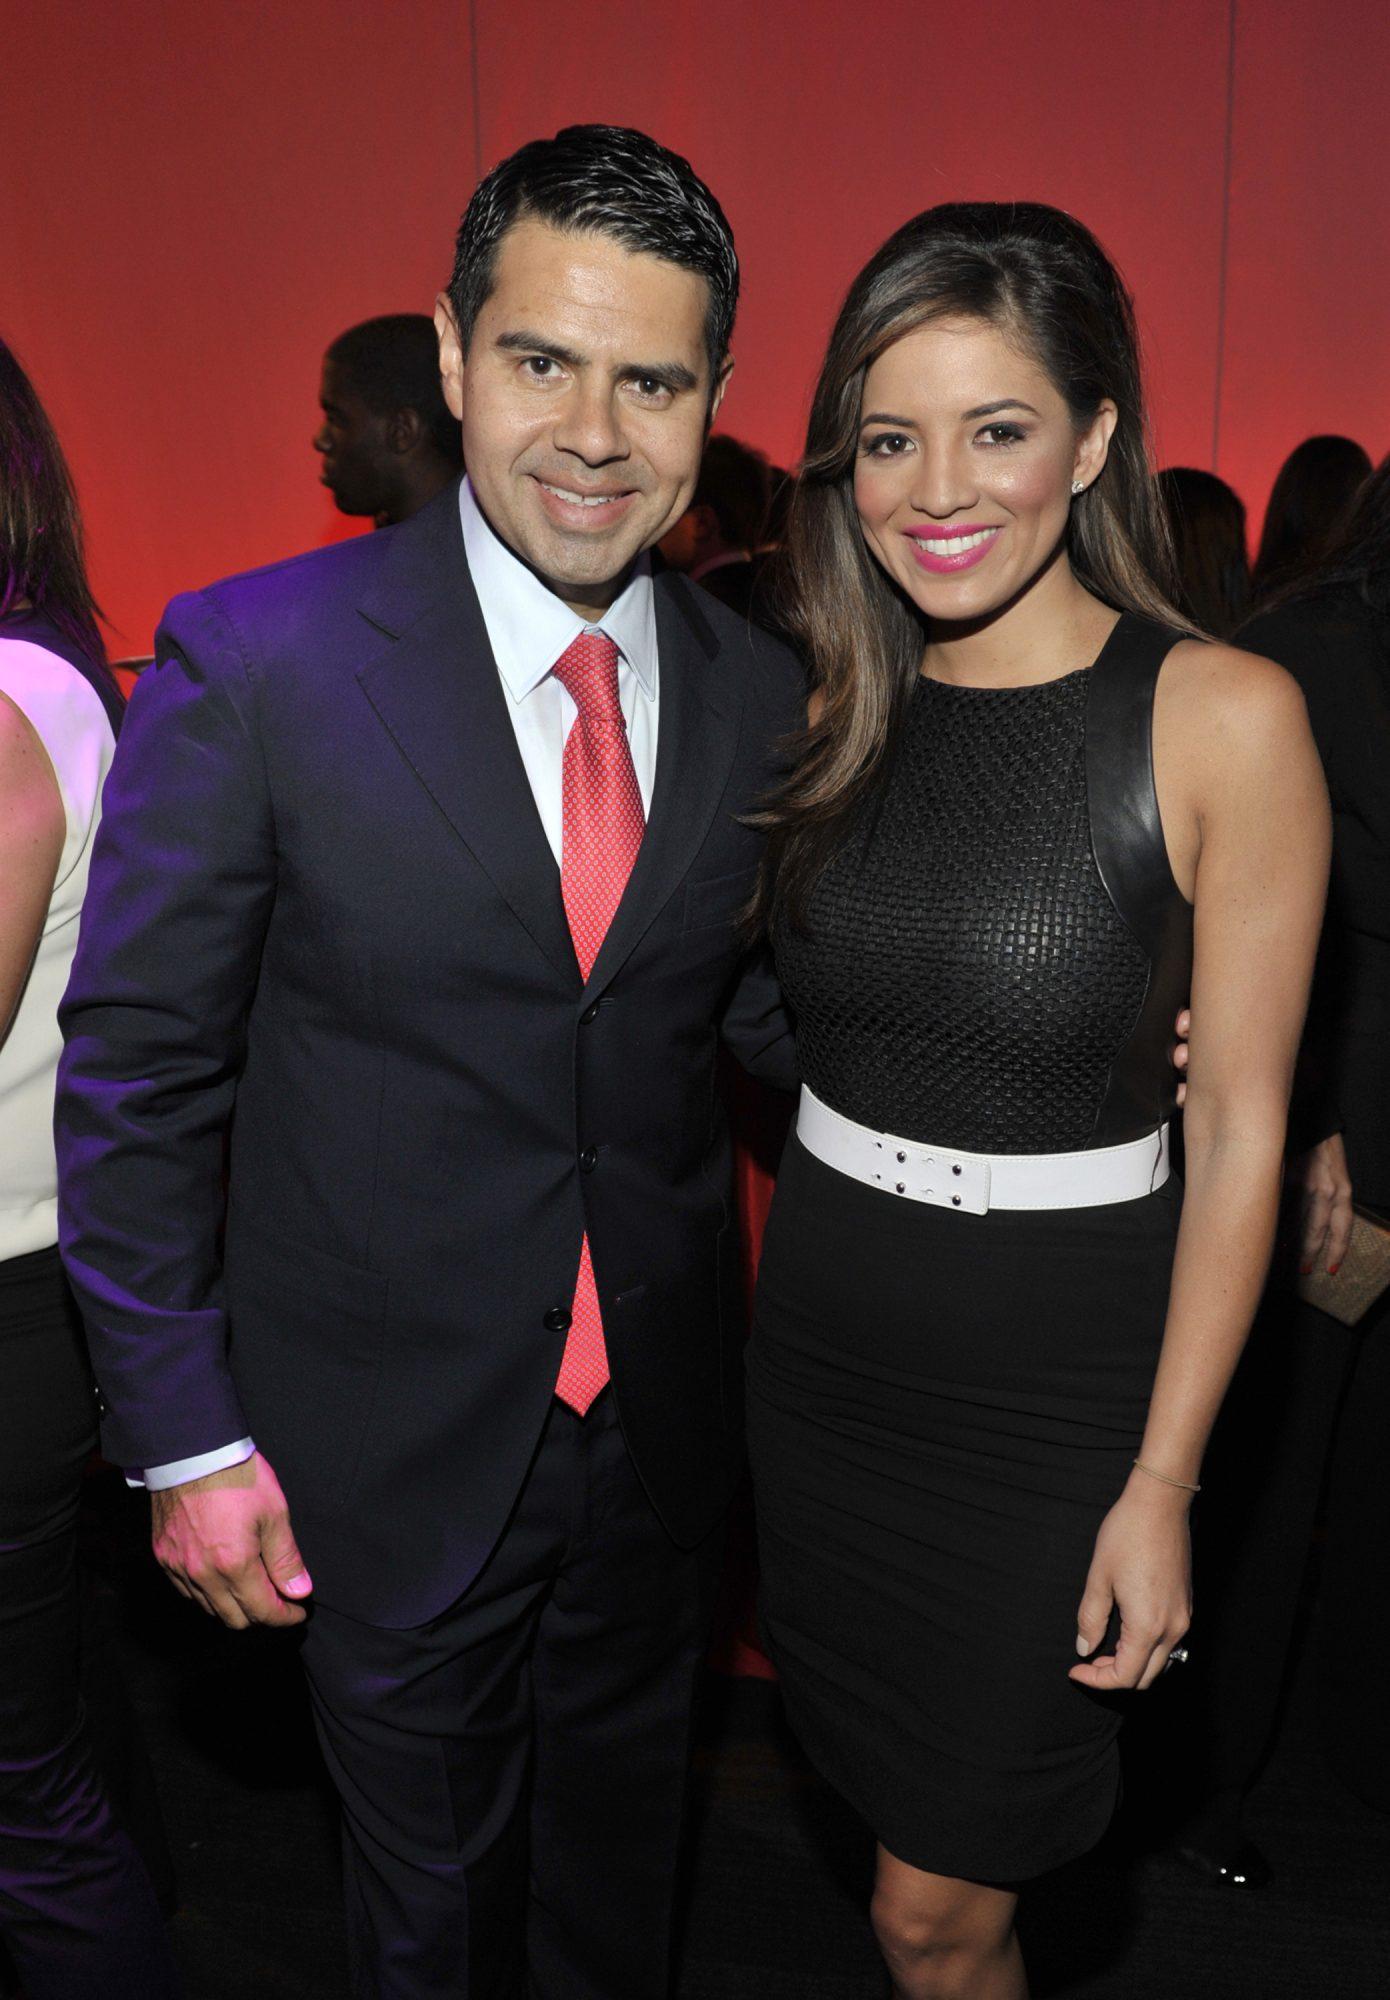 Cesar Conde and Pamela Silva Conde